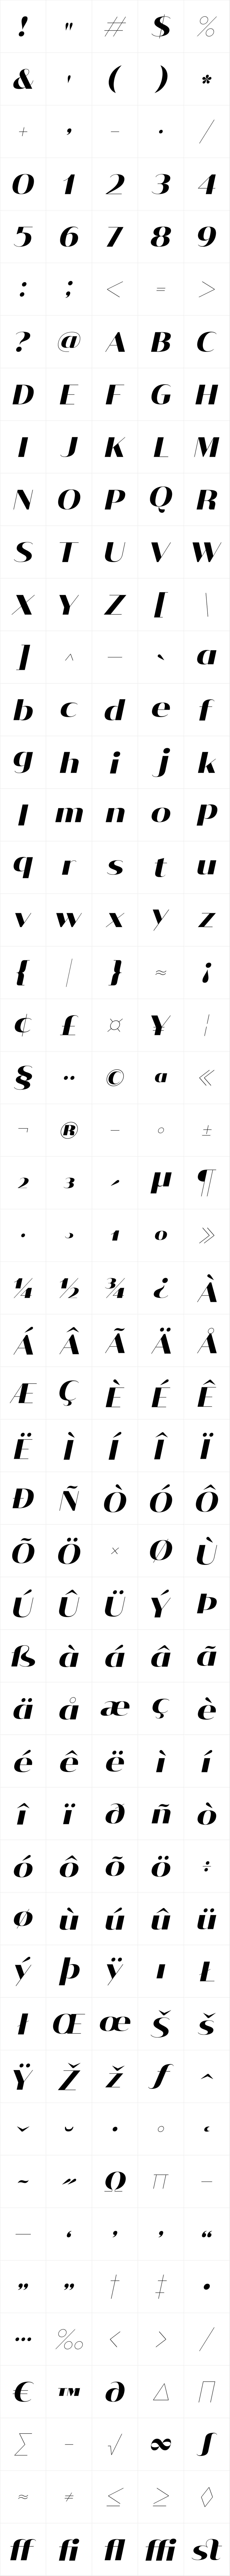 Vage Semibold Italic